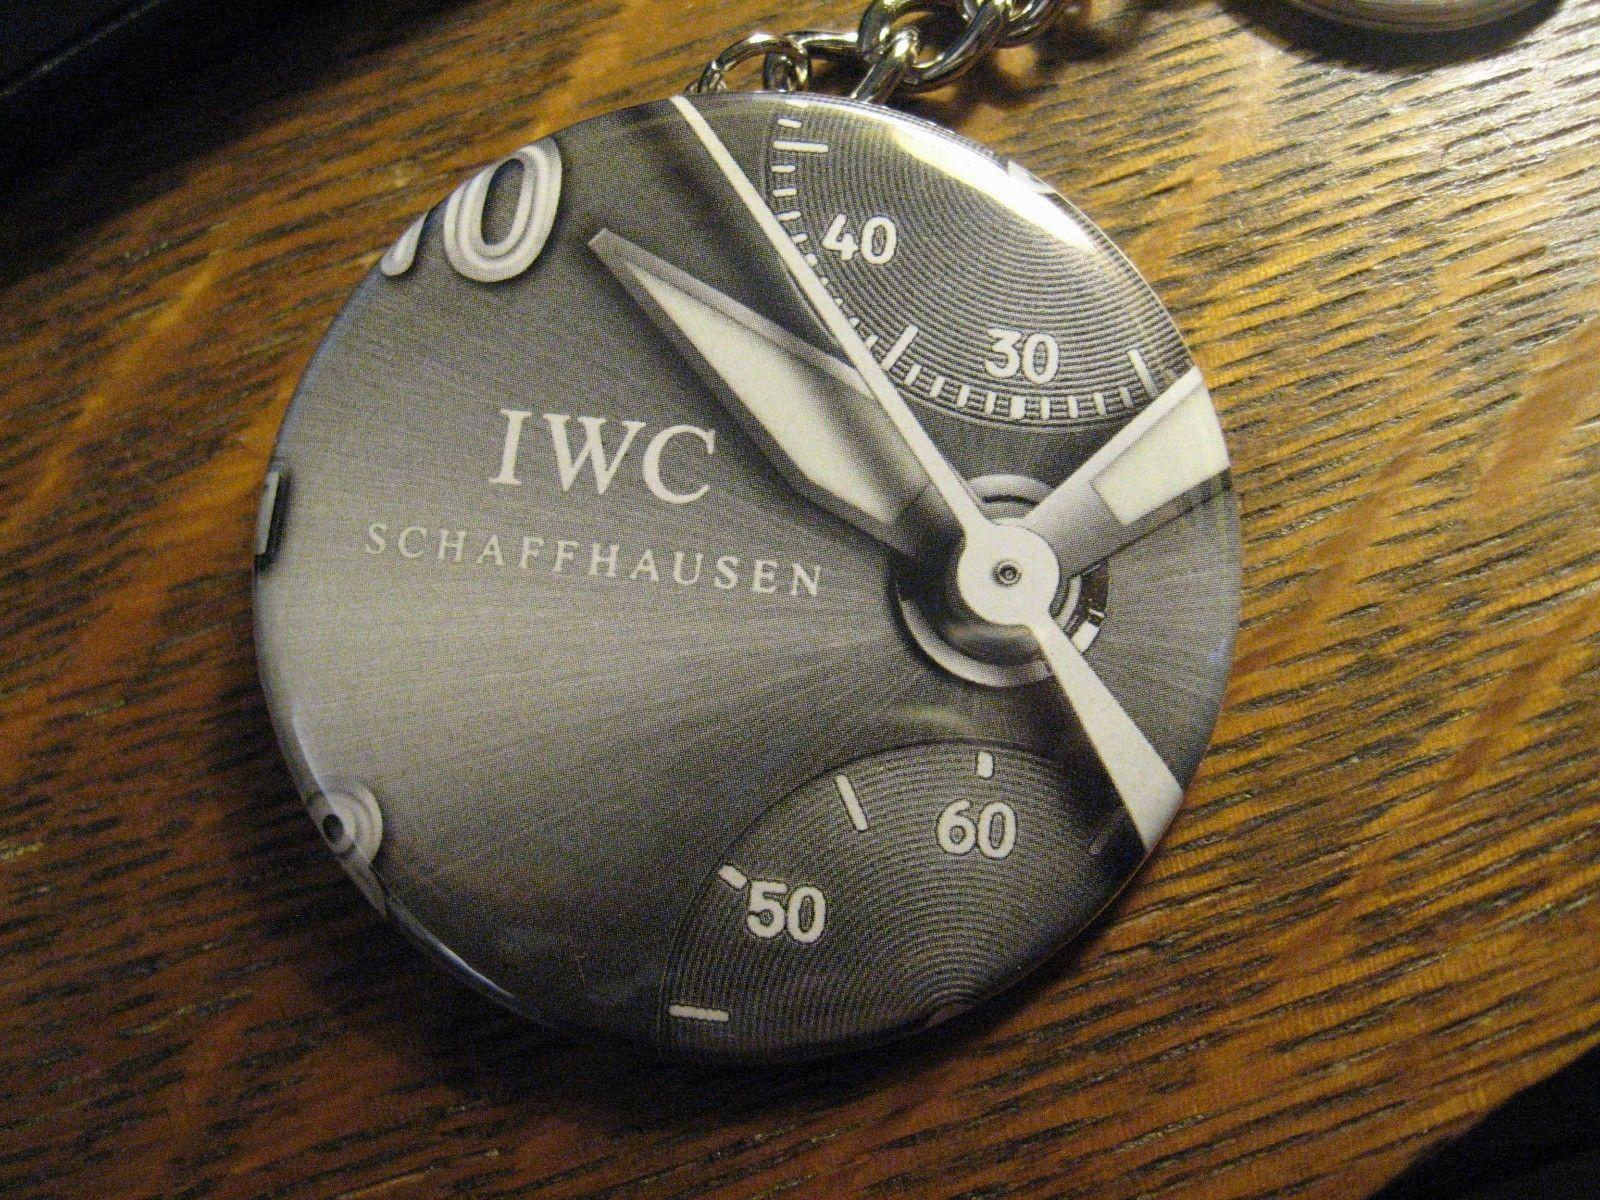 IWC Schaffhausen Keychain - Repurposed Magazine Ad Backpack Purse Clip Ornament